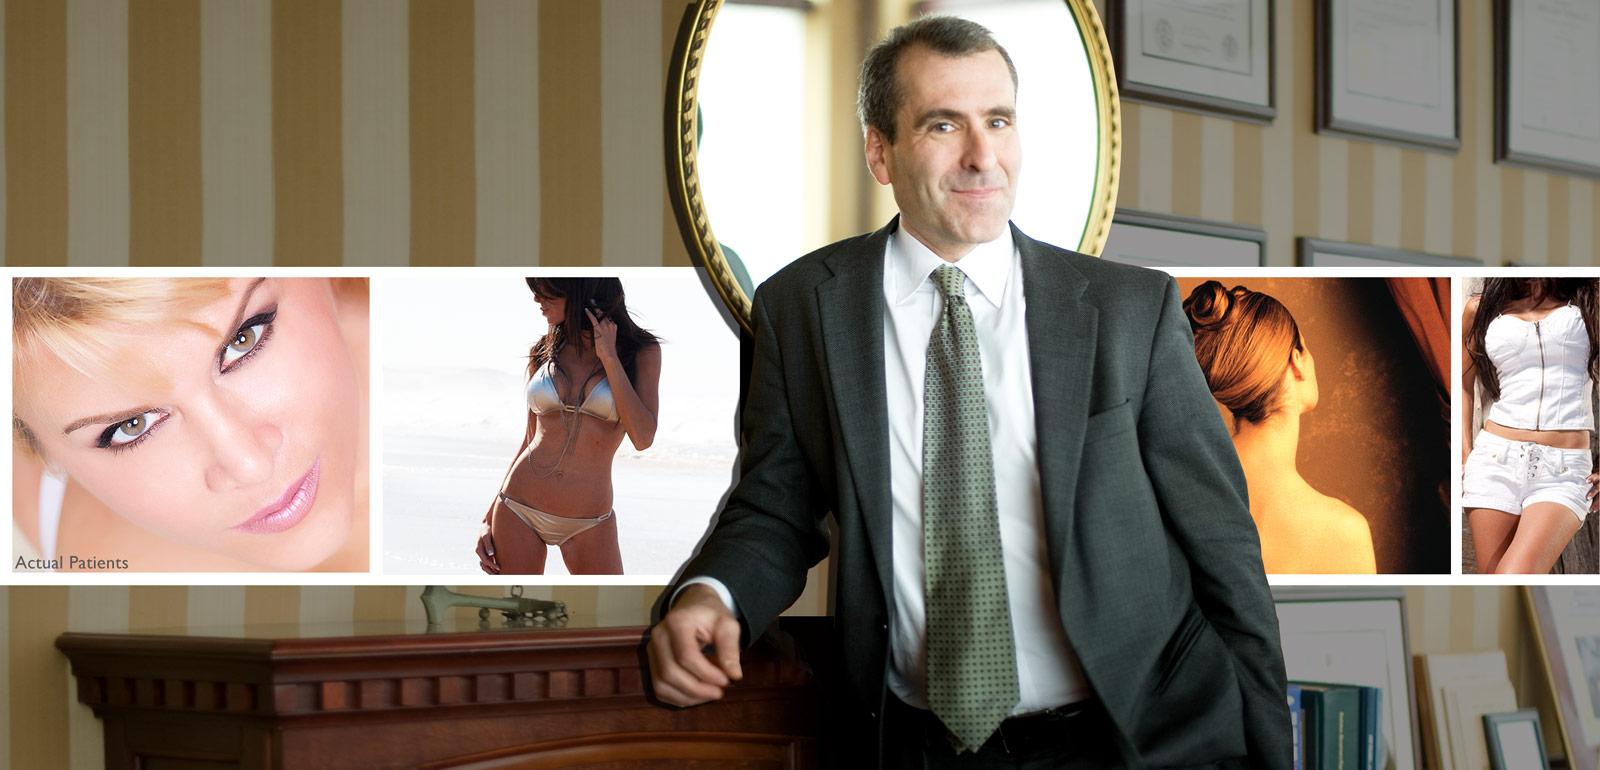 Dr. Adam Tattelbaum